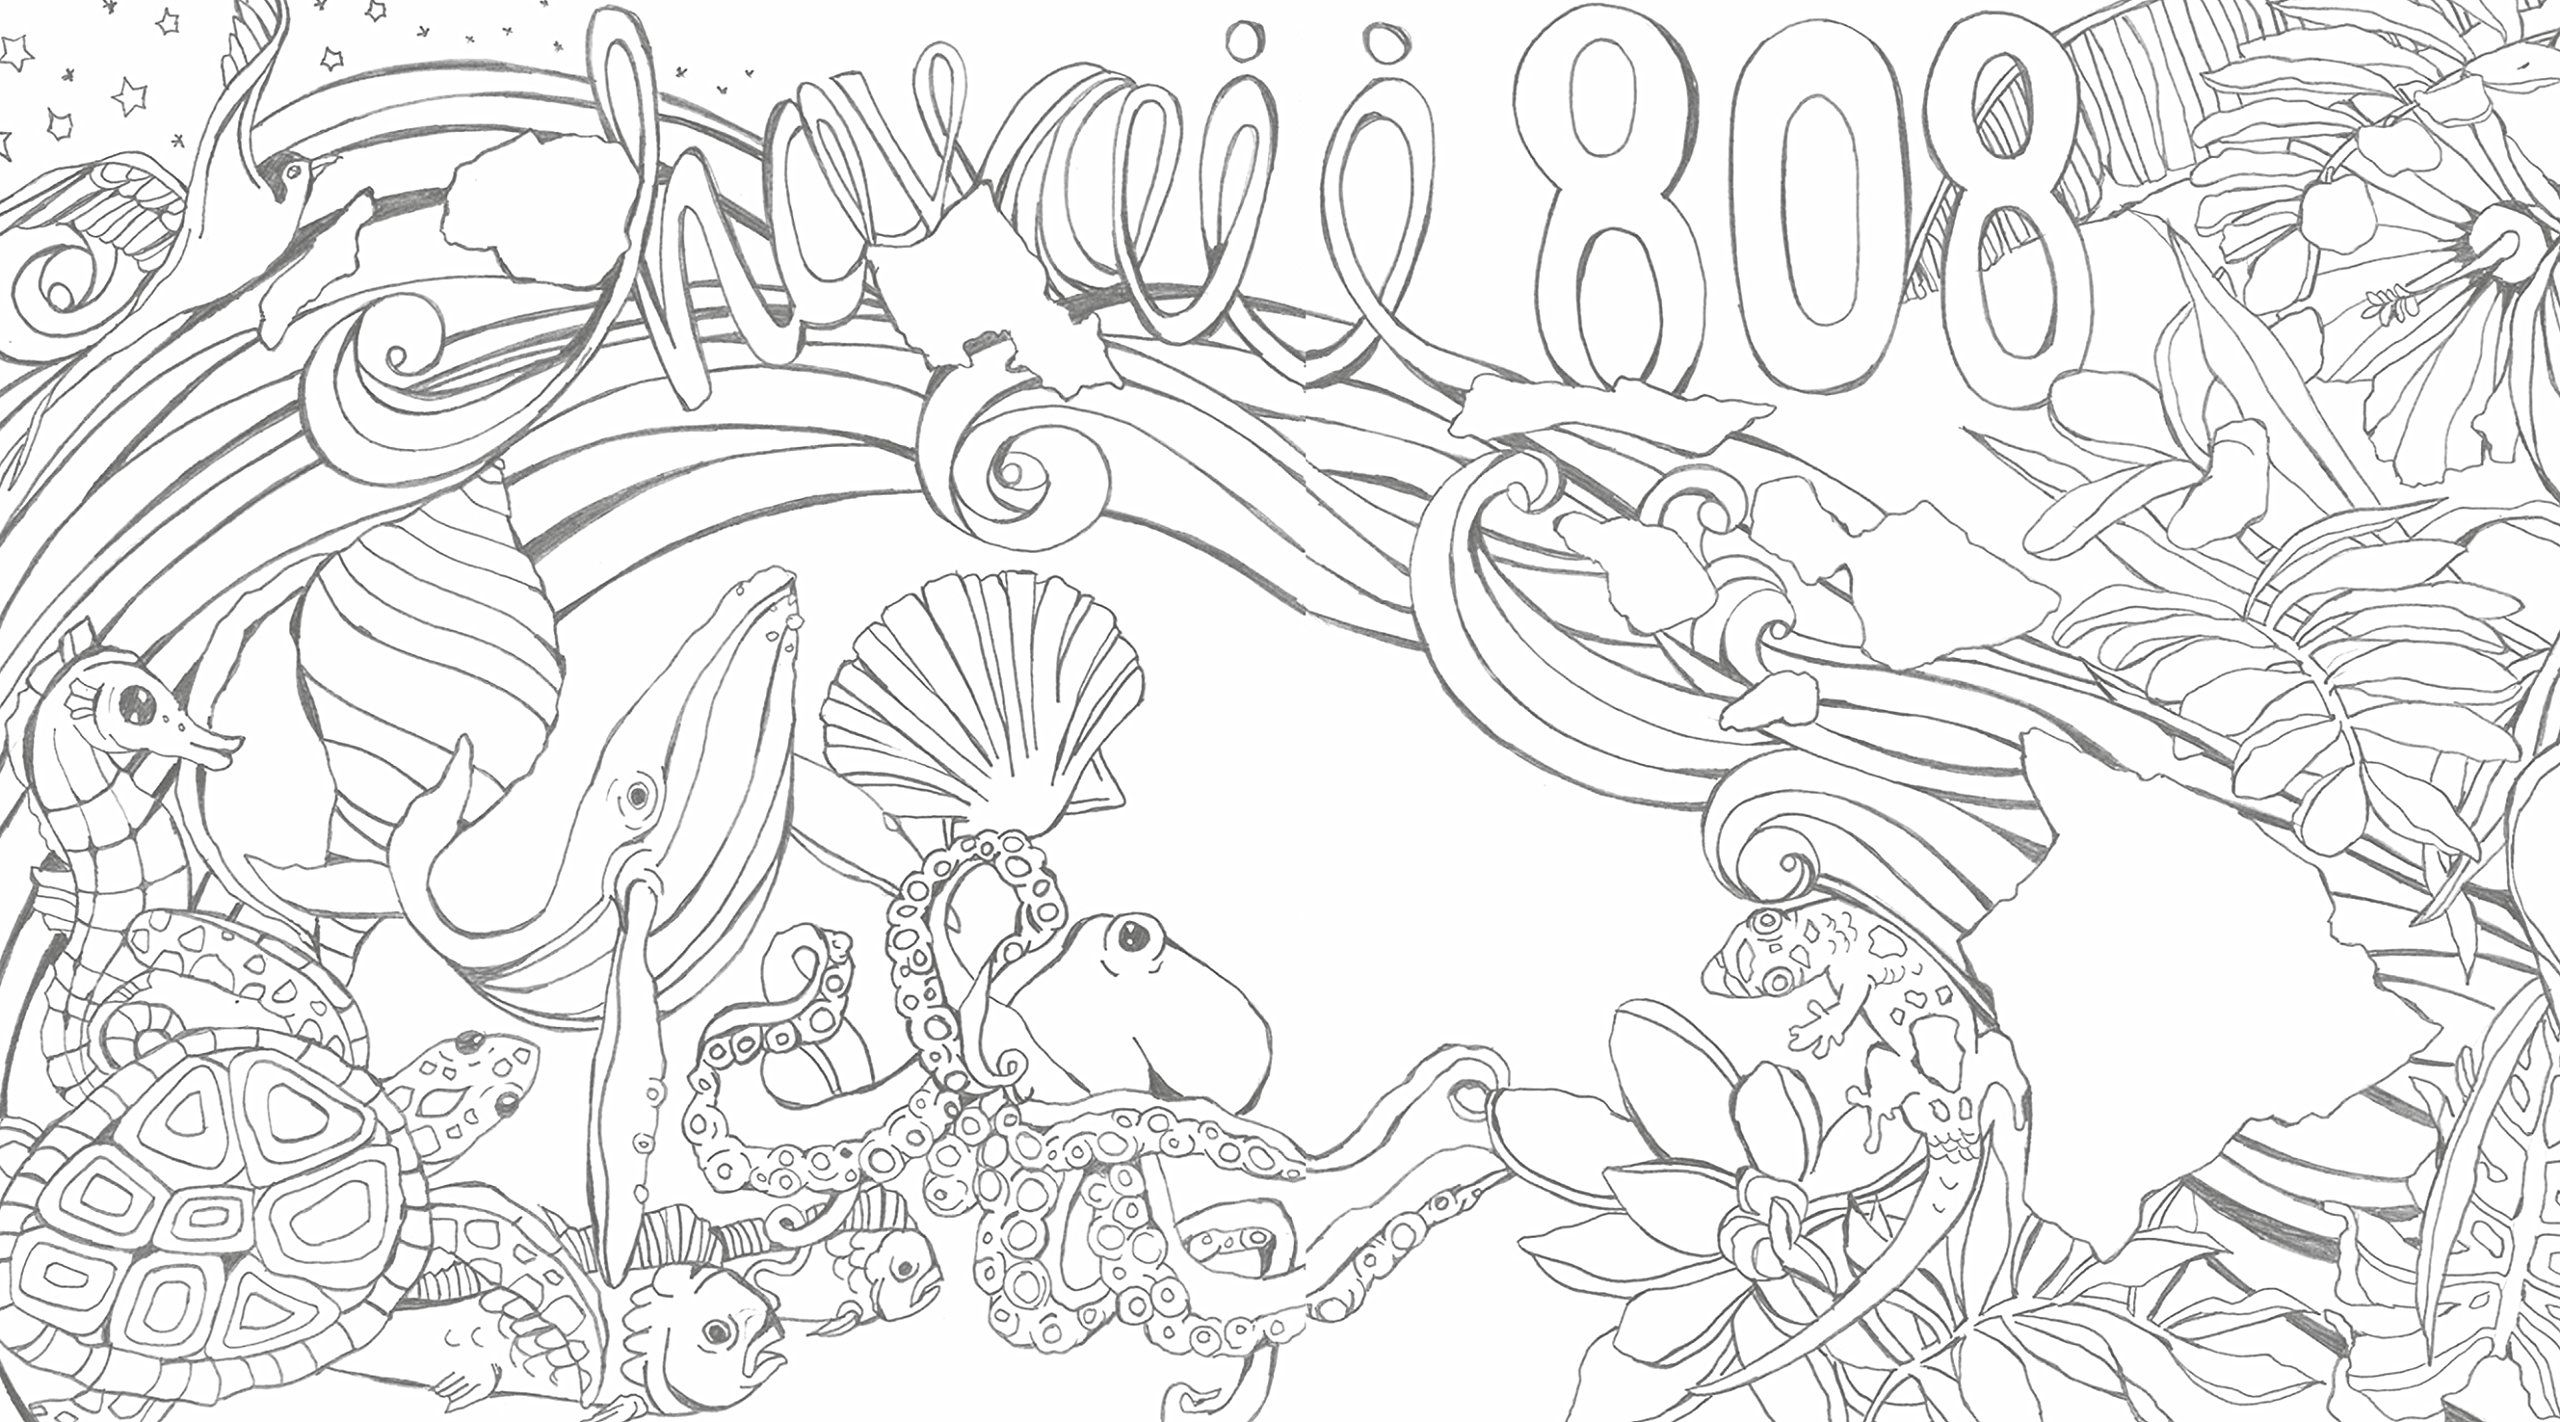 coloring books colors of hawaii - Hawaii Coloring Book